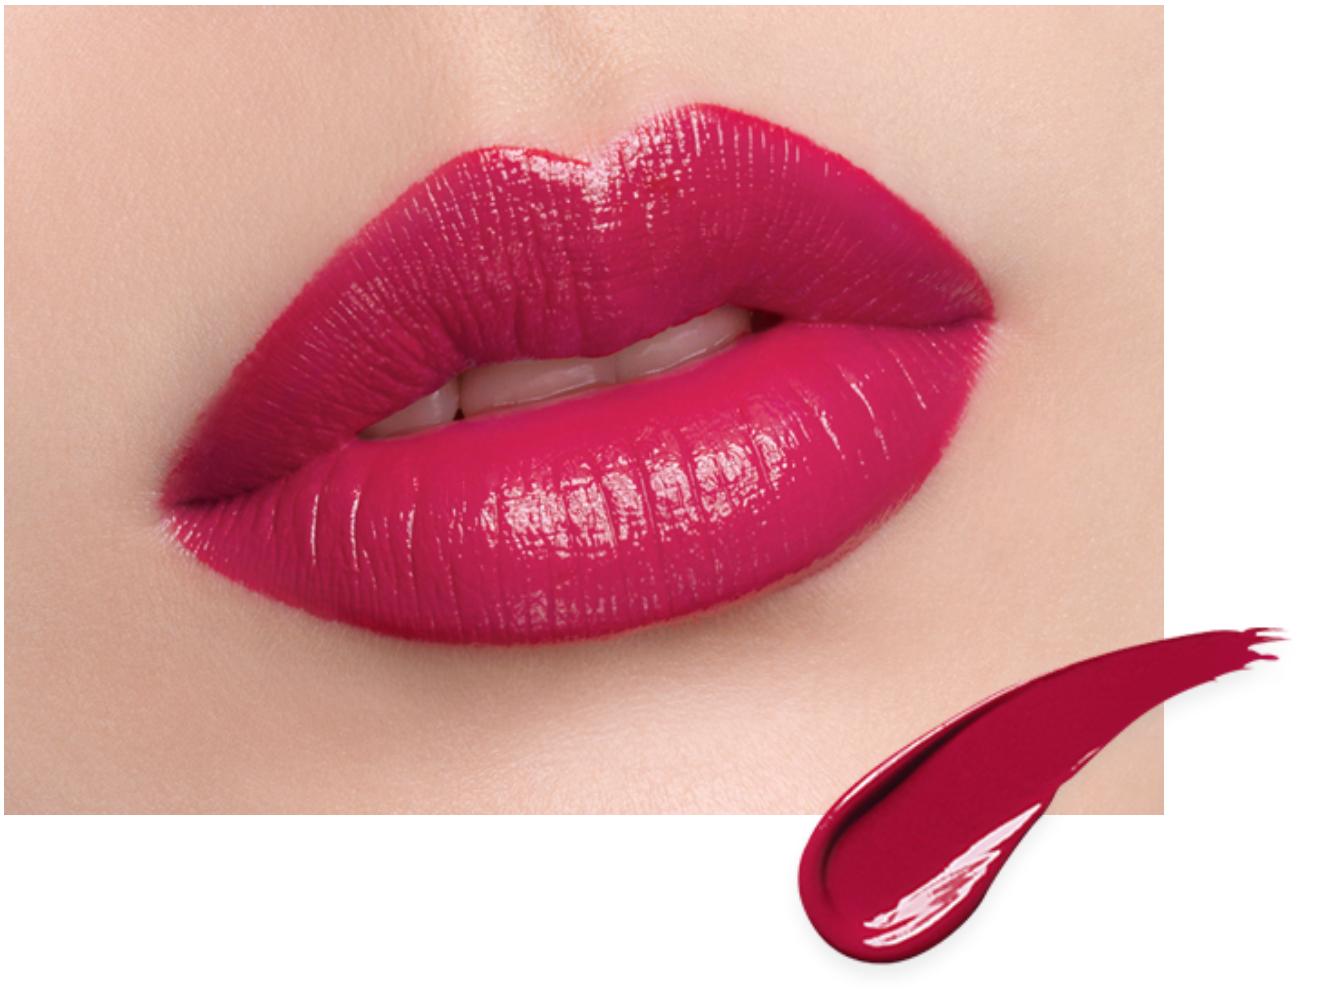 laneige-silk-intense-lipstick-365.png